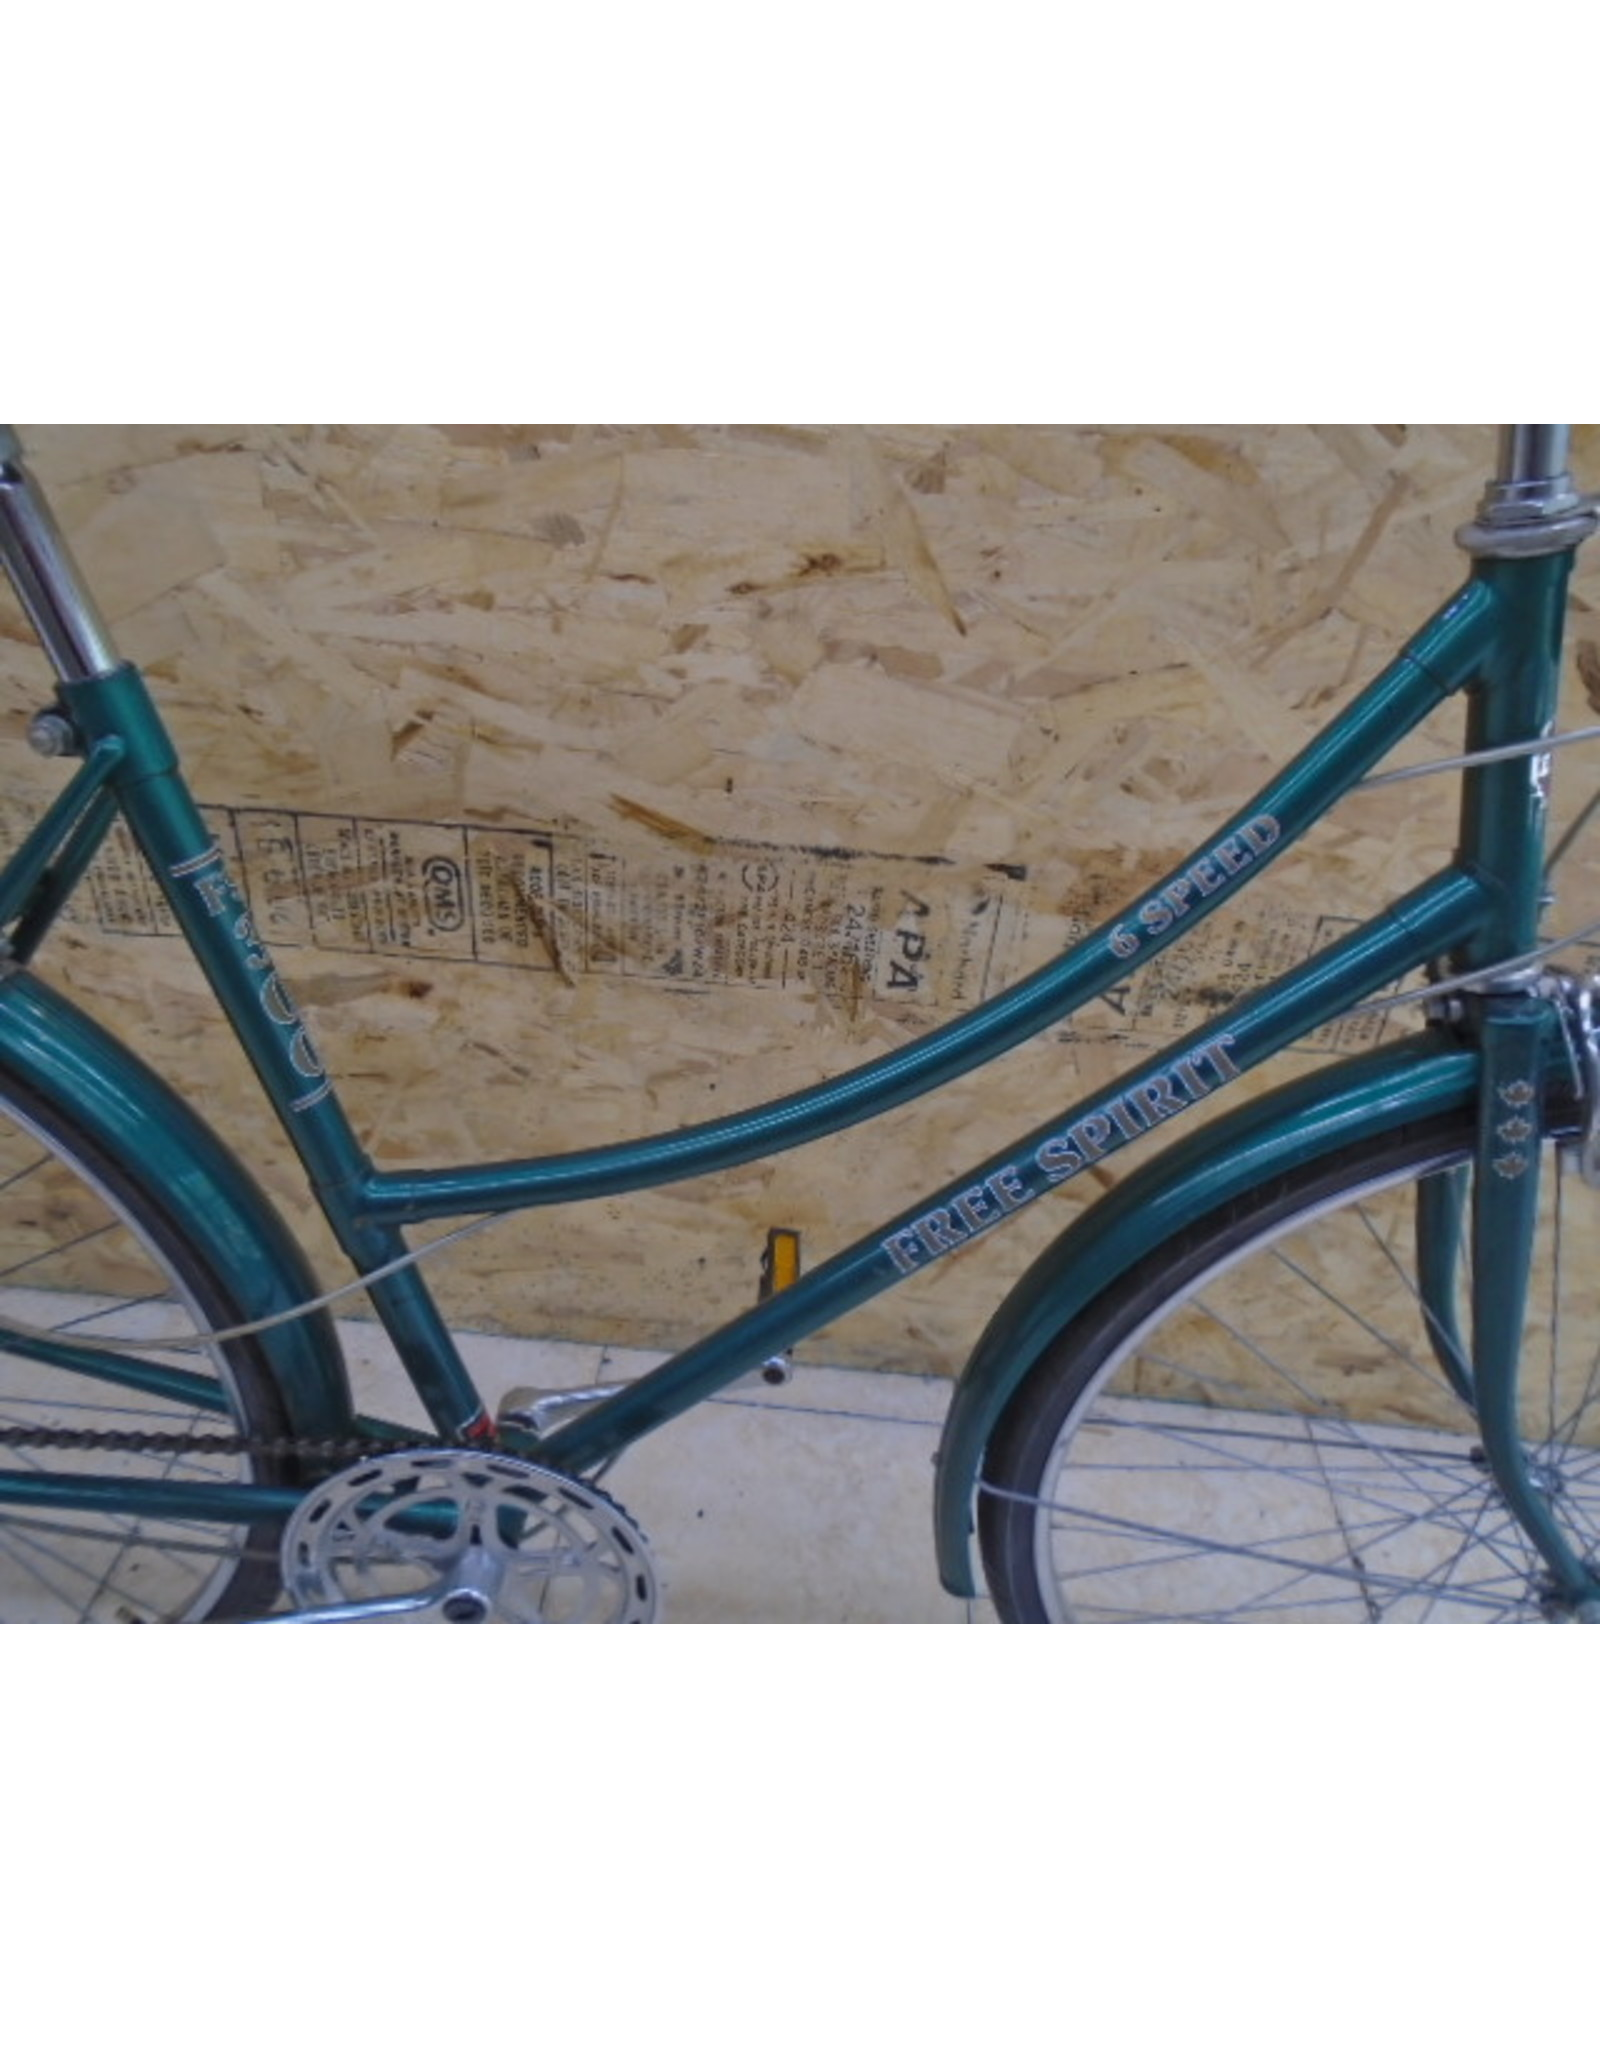 "Vélo usagé de ville Freespirit 20"" - 9855"